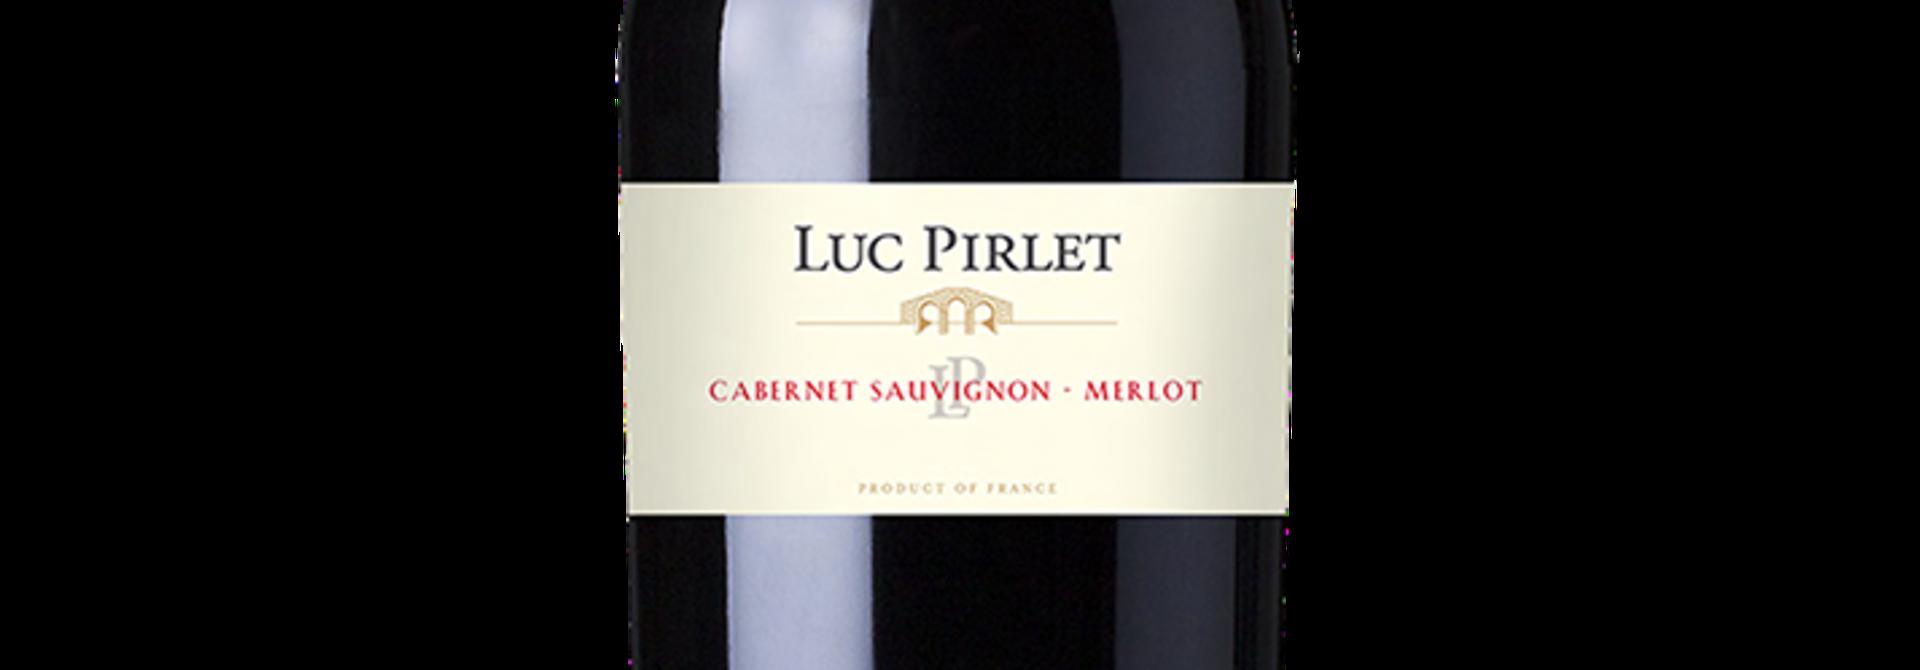 Bi-cepage Cabernet Sauvignon-Merlot 2016, Luc Pirlet